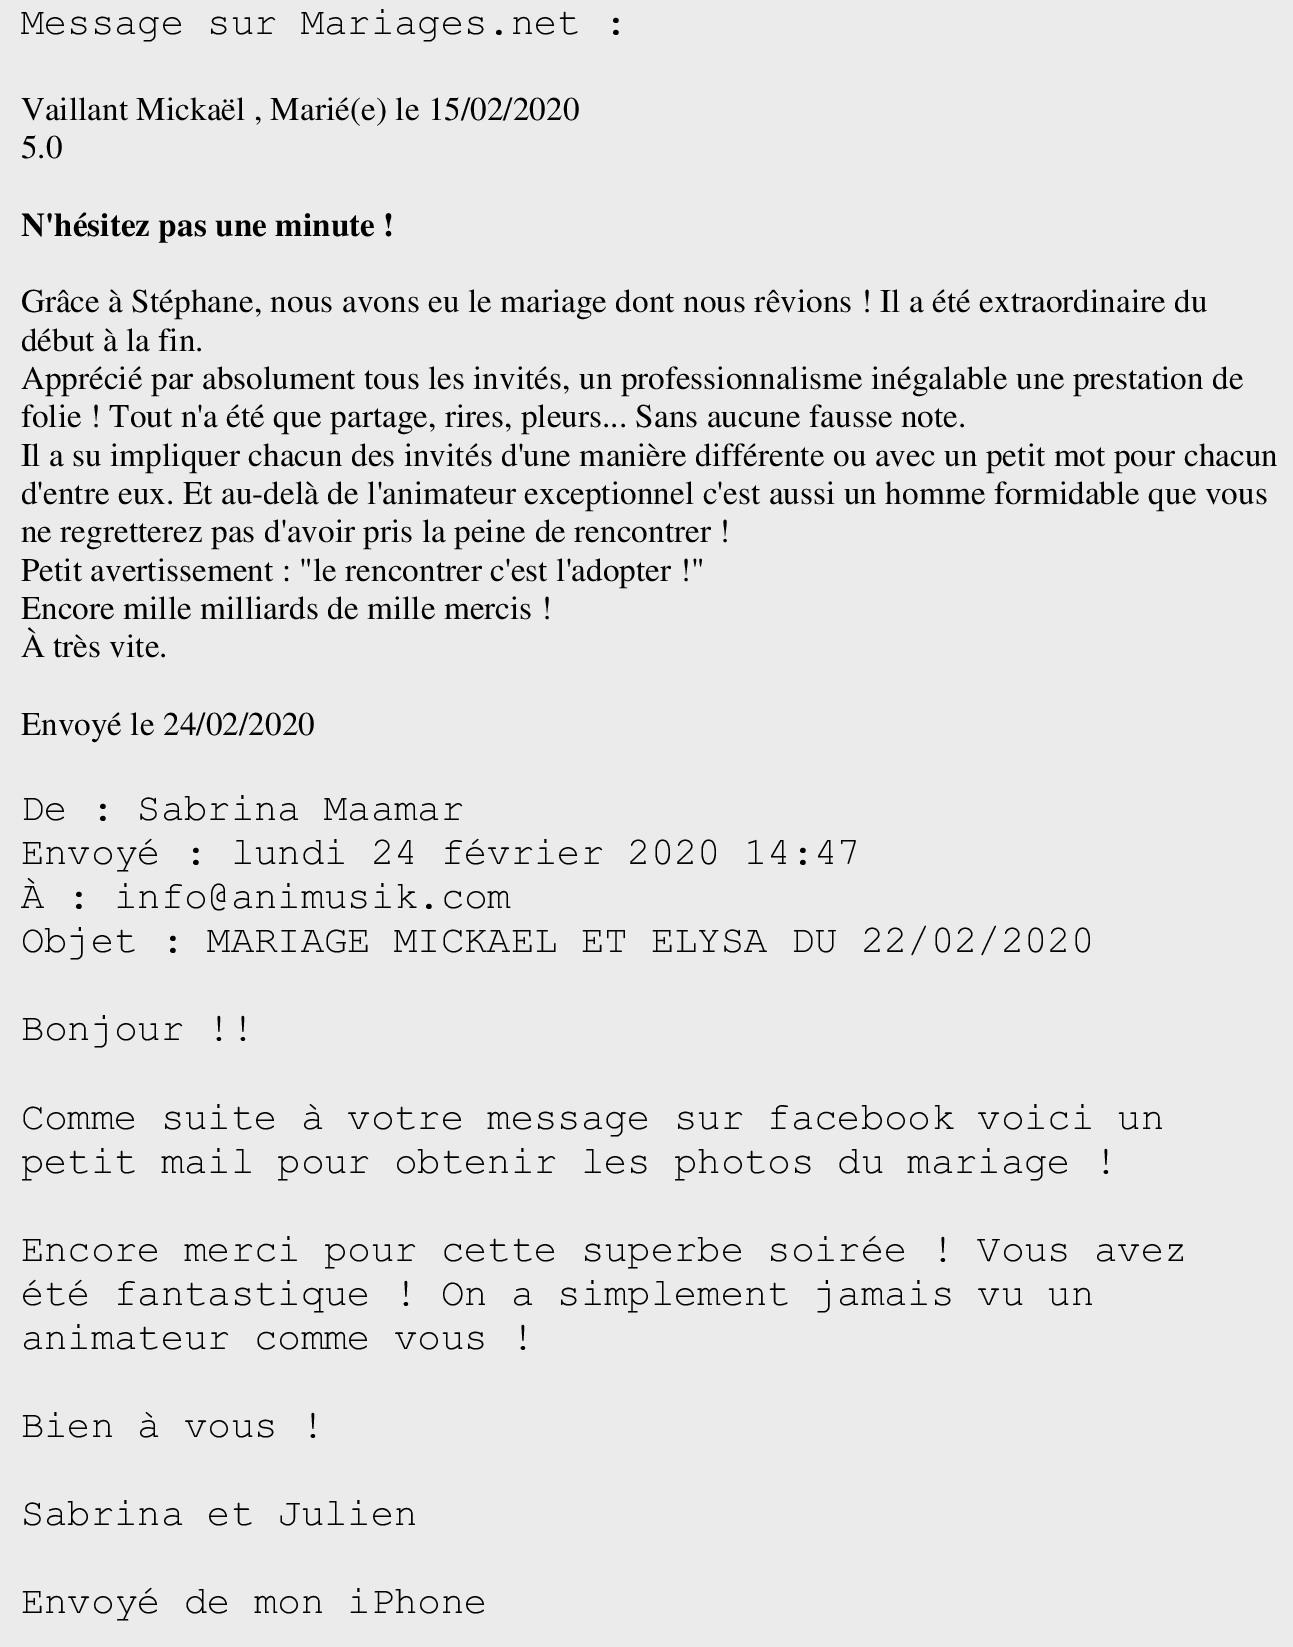 Mariage-VAILLANT-Mickaël-_-GAIPPE-Elysa-